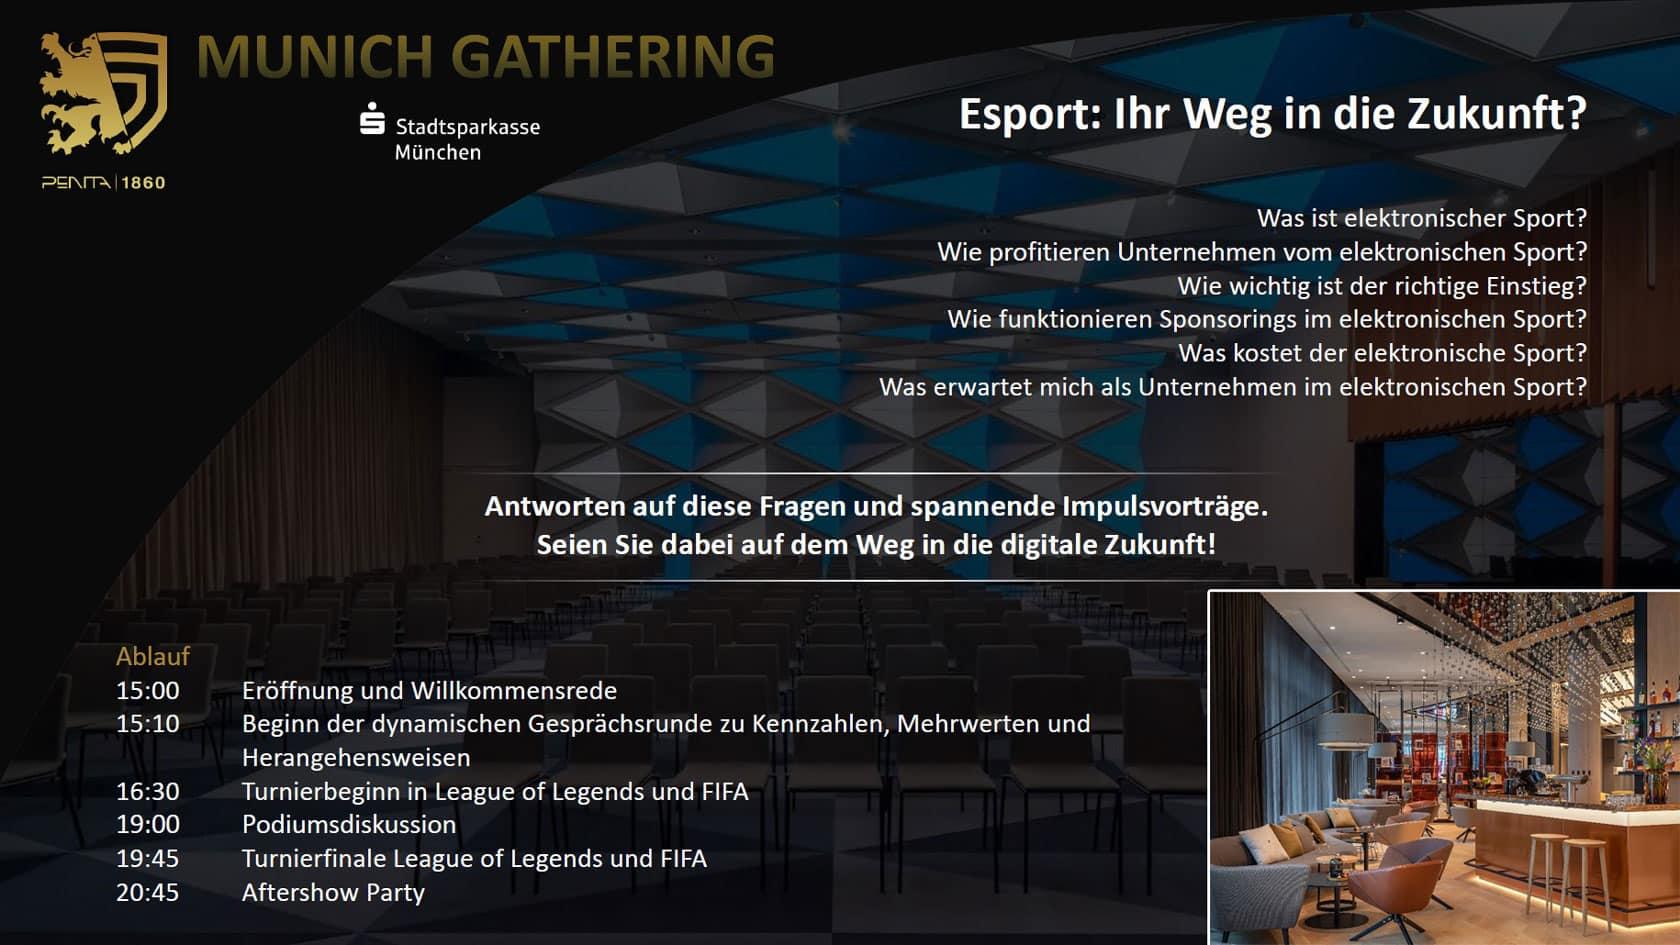 Munich Gathering header babt